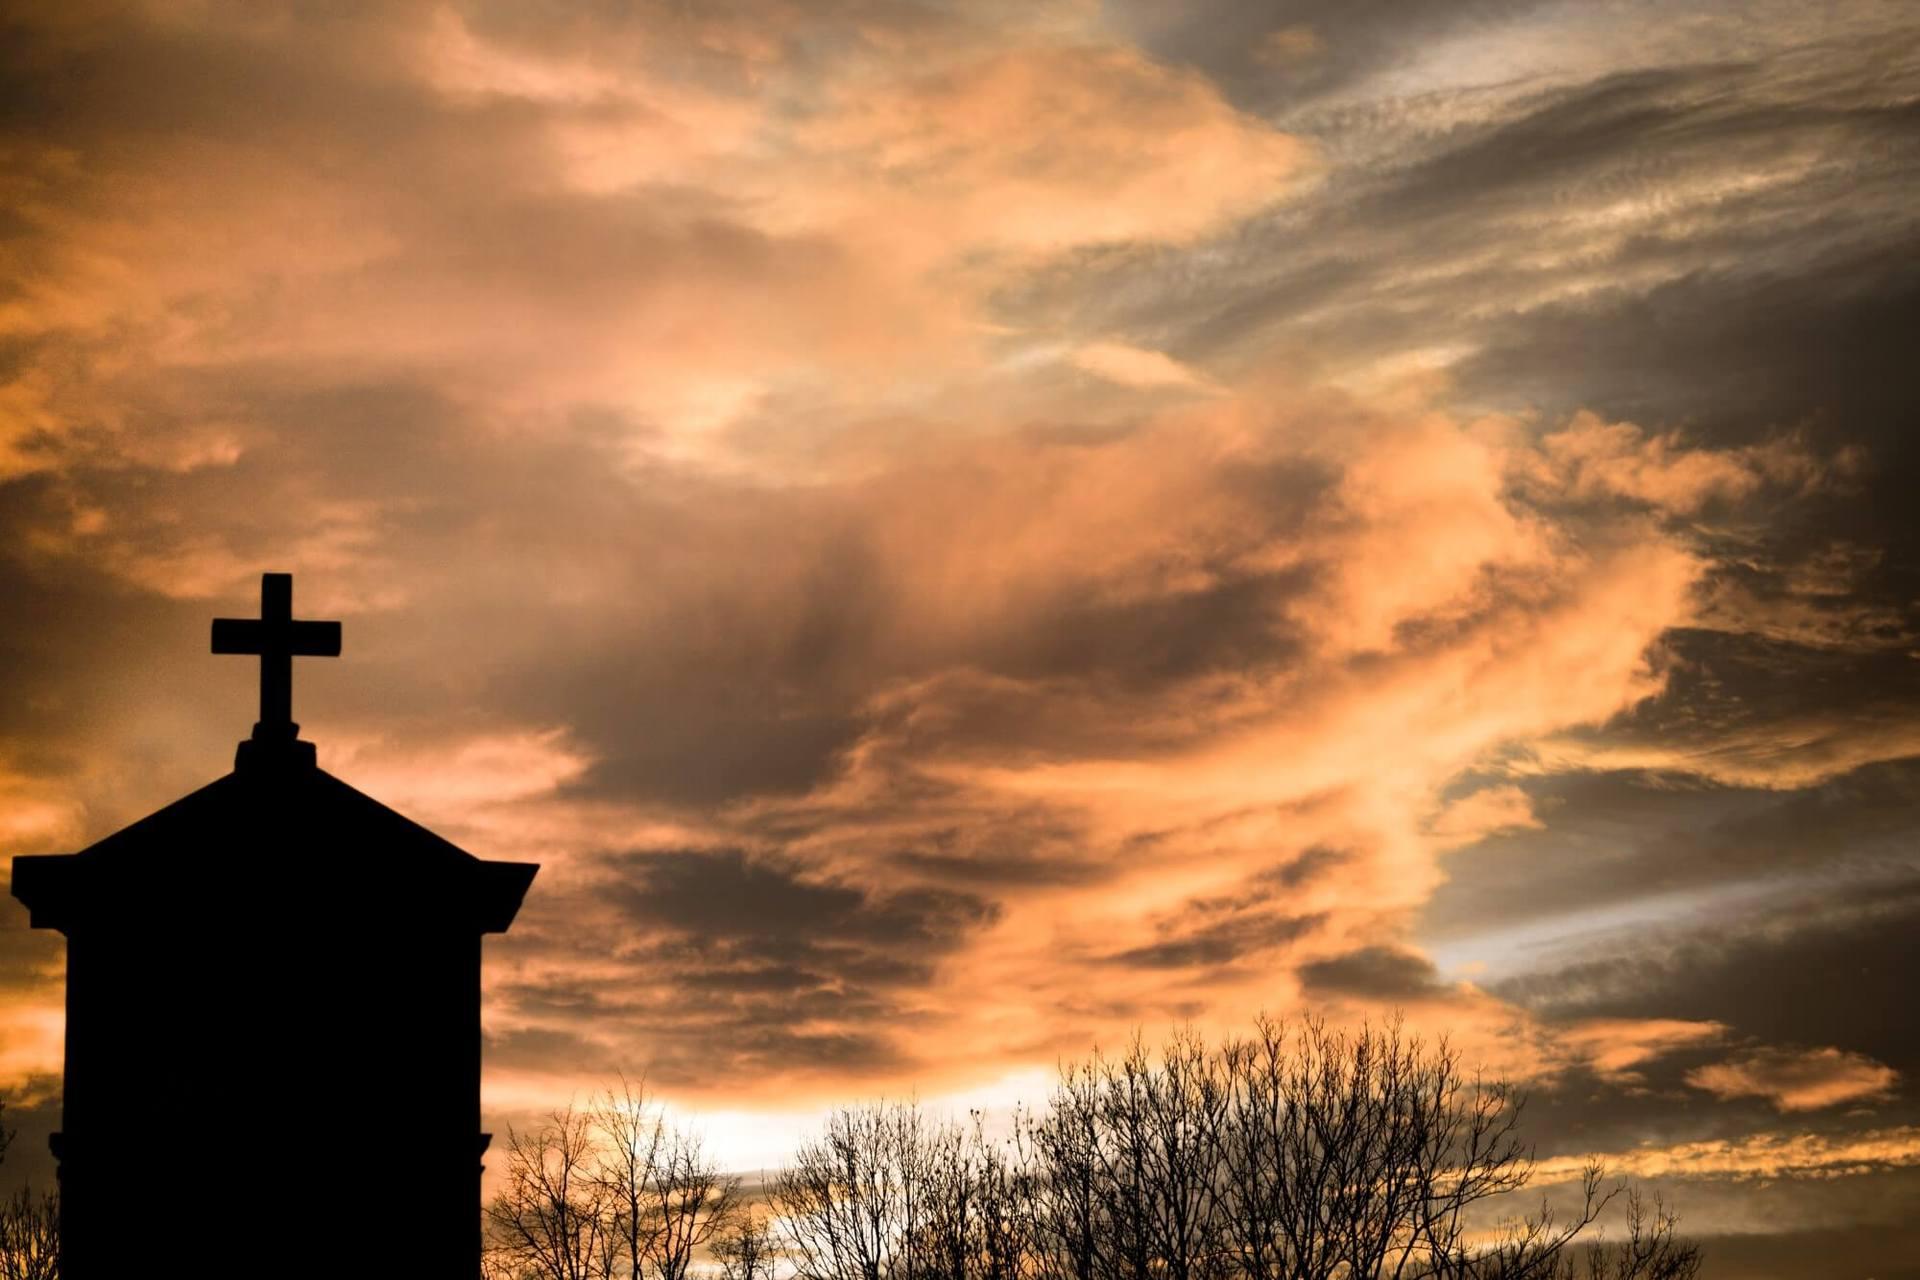 Sky and cross